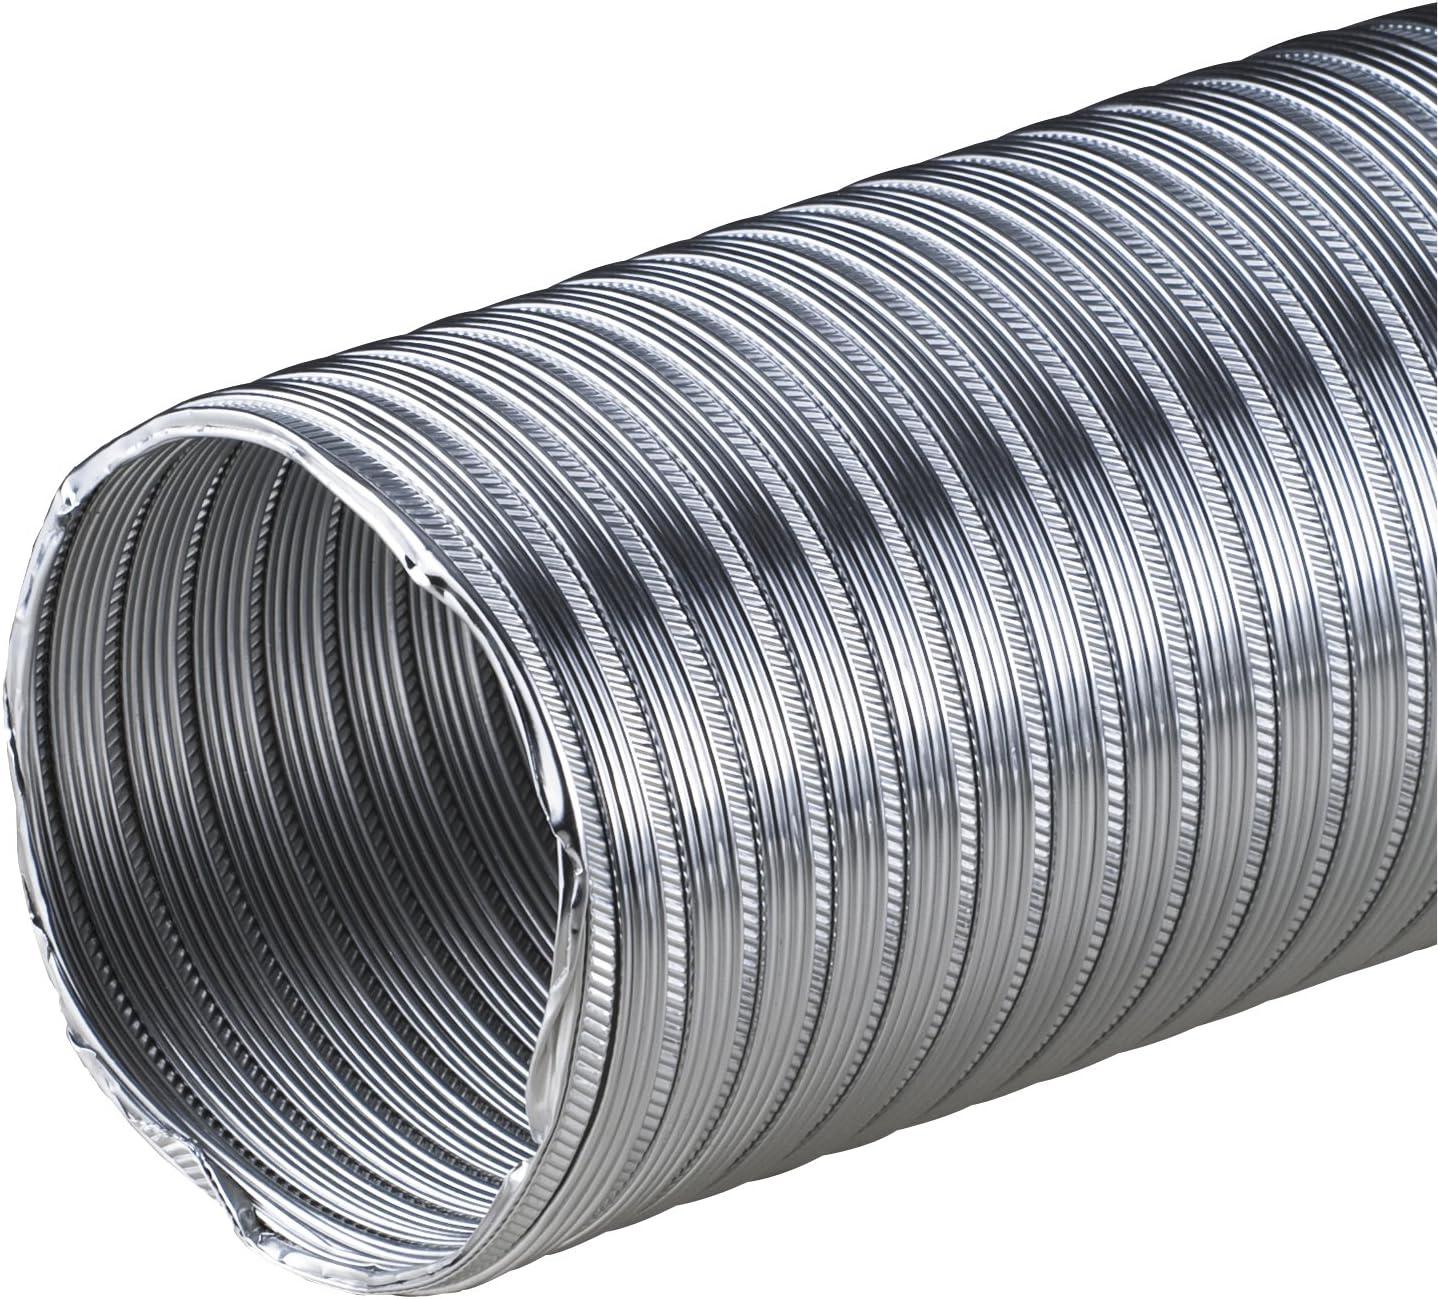 Alu-Flex-Rohr 3m Flexrohr /Ø 115 mm 115mm Alurohr Flexschlauch Schlauch Aluminium Aluflexrohr flexibles Aluminiumrohr Aluflex Hitzebest/ändig AF